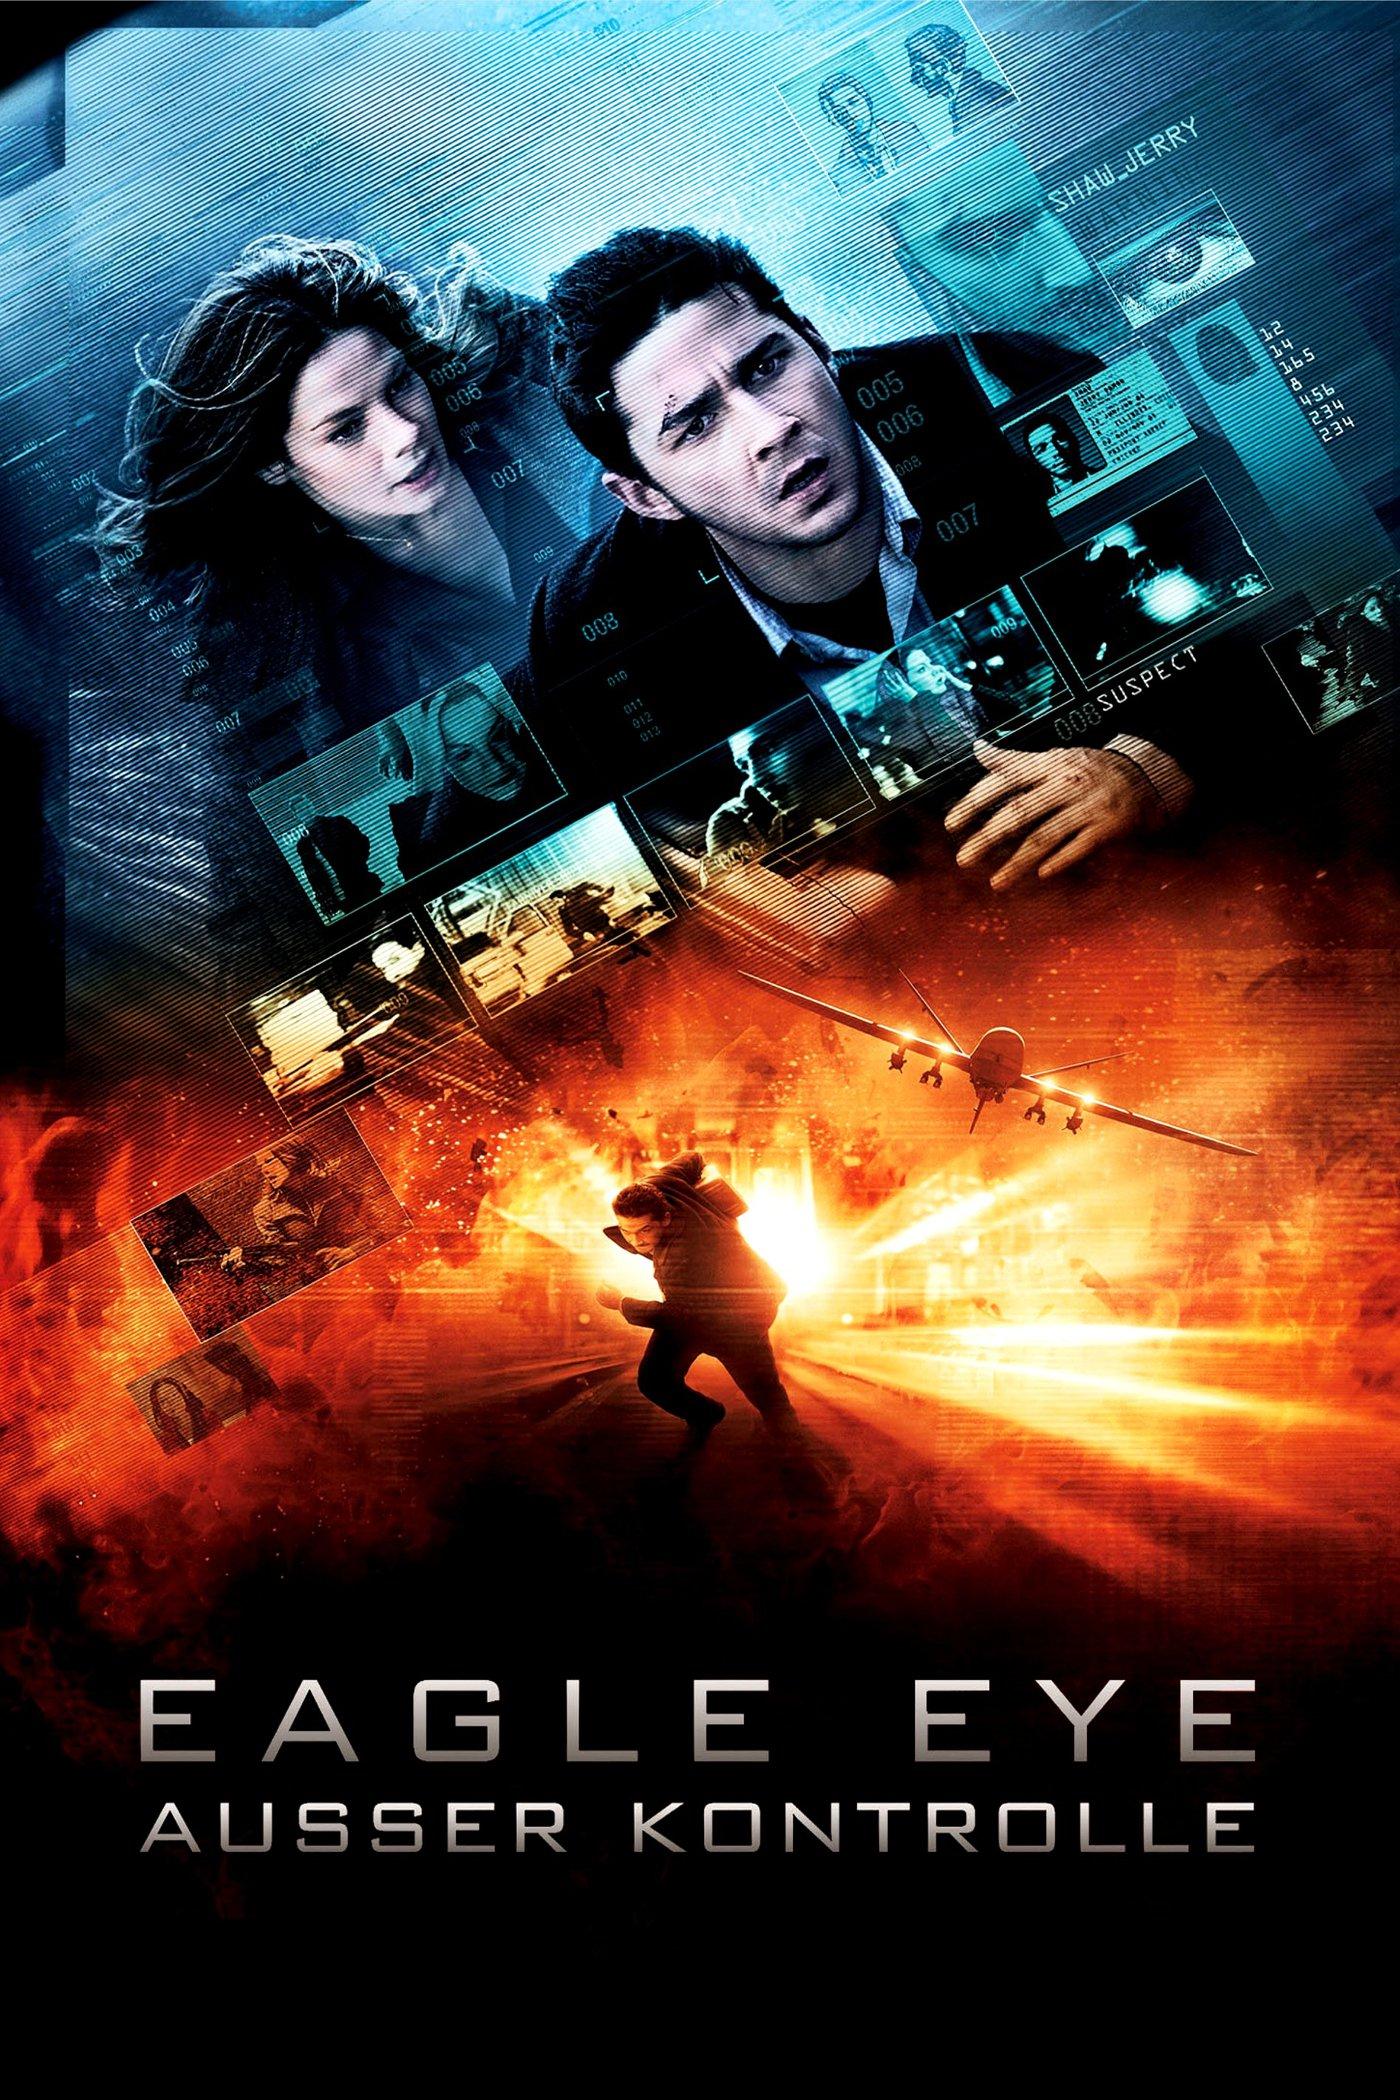 """Eagle Eye - Außer Kontrolle"""